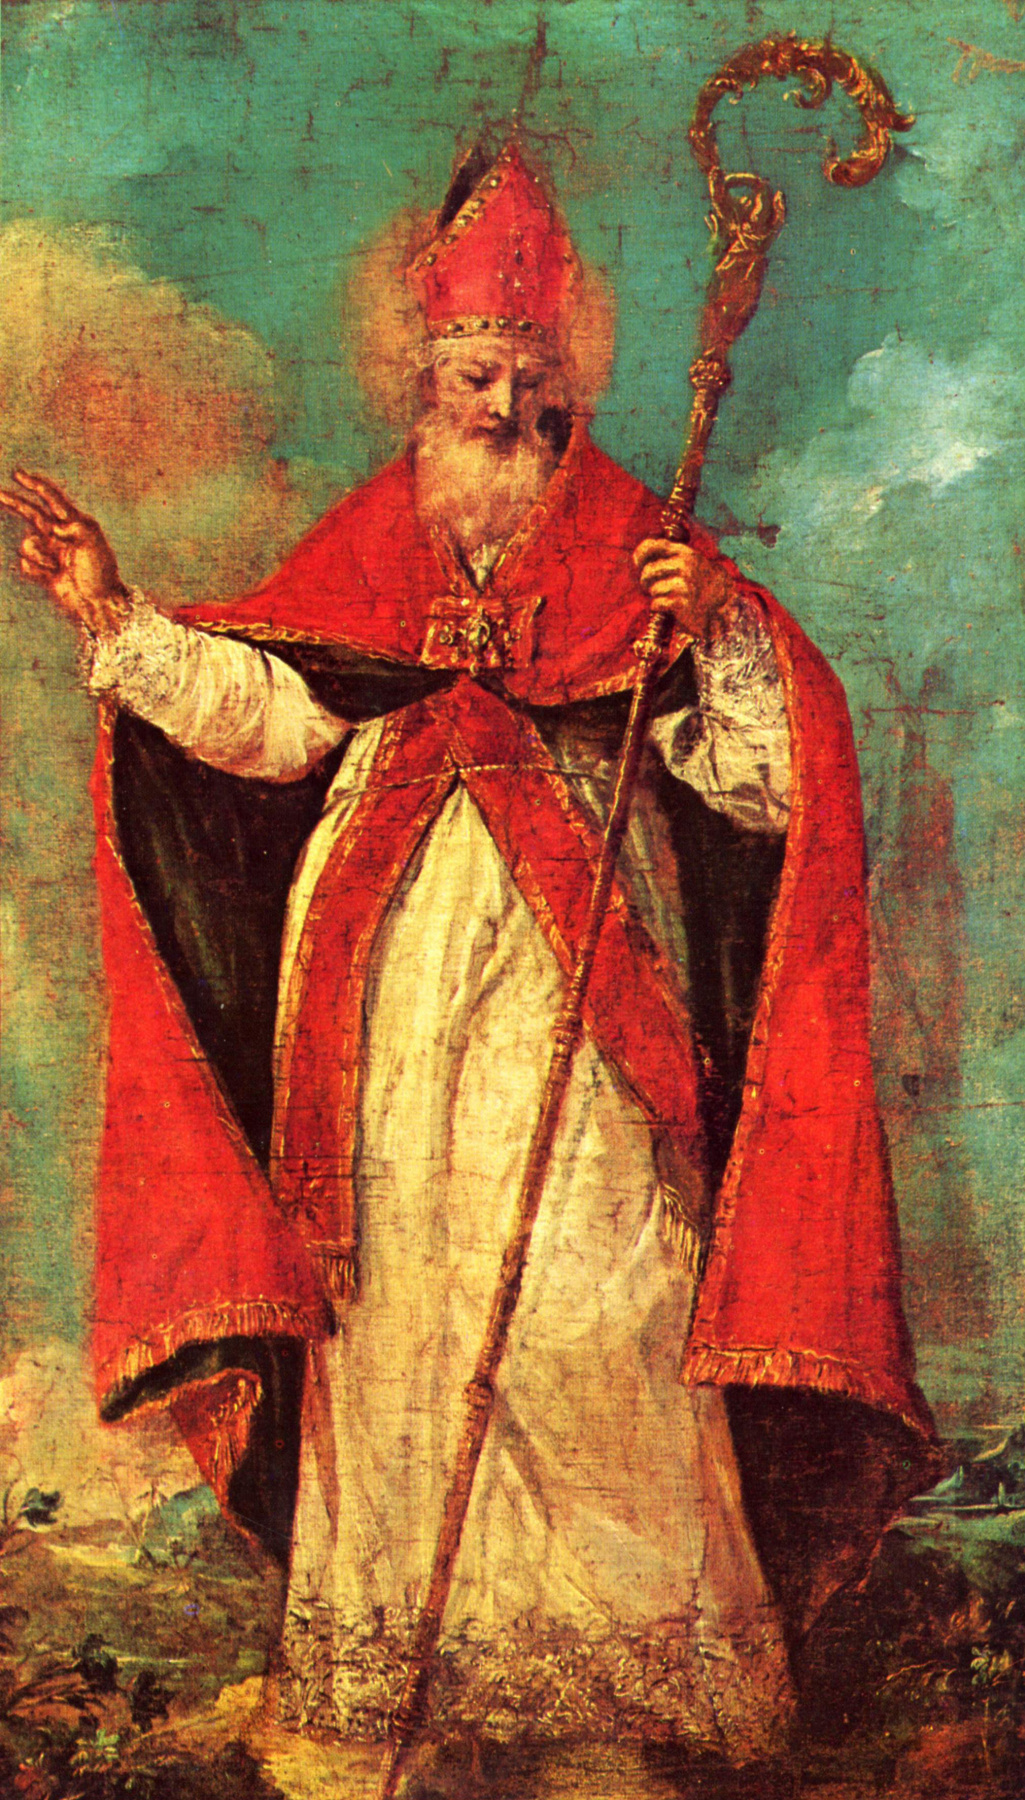 Francesco Guardi. St. Nicholas